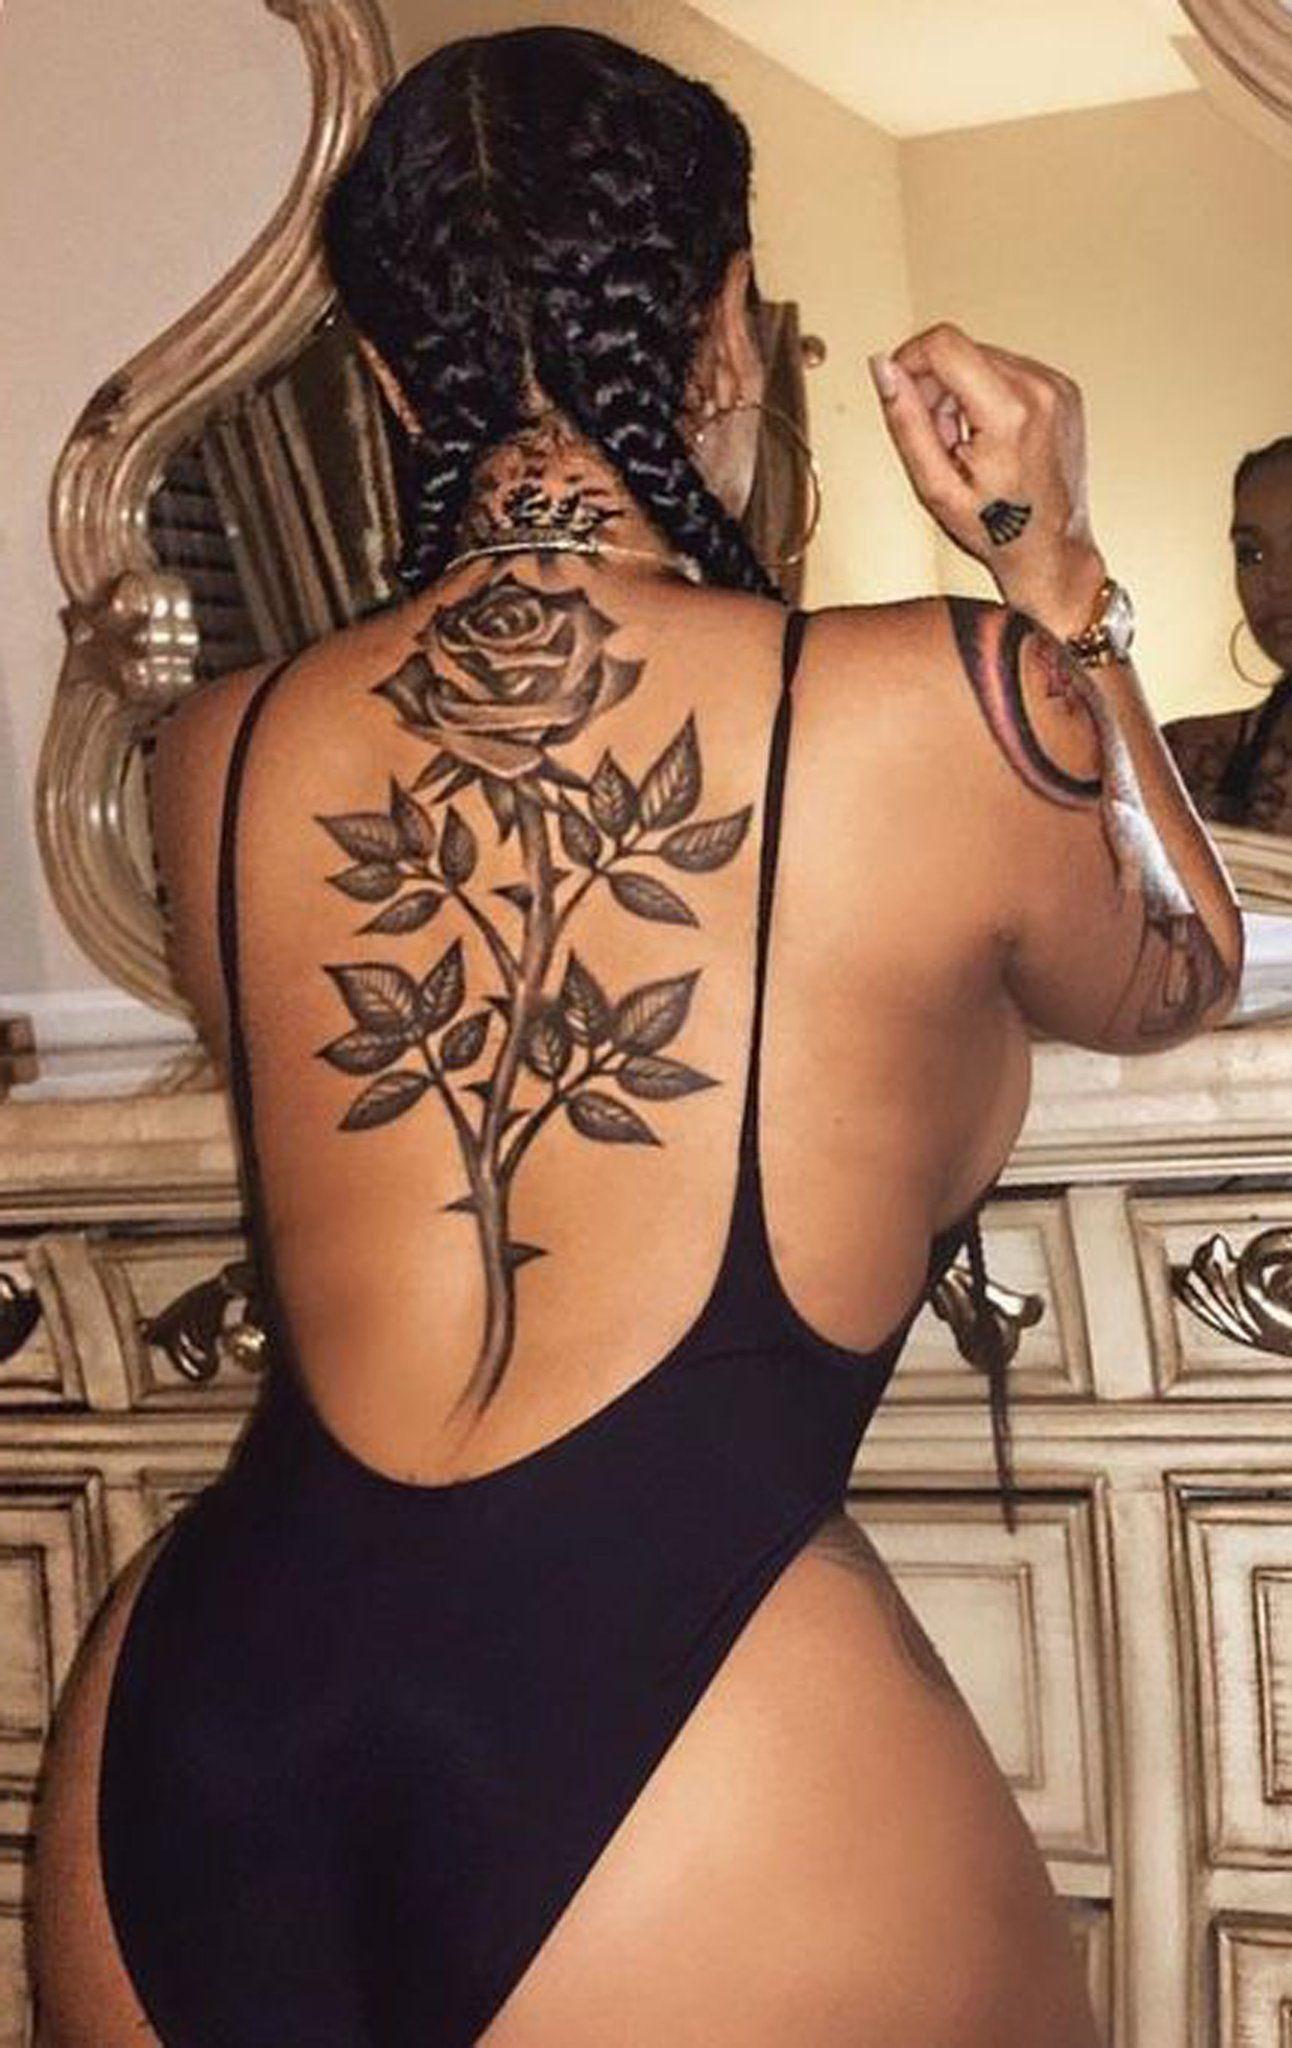 50 Beautiful Rose Tattoo Ideas Spine Tattoos For Women Black Girls With Tattoos Girl Back Tattoos